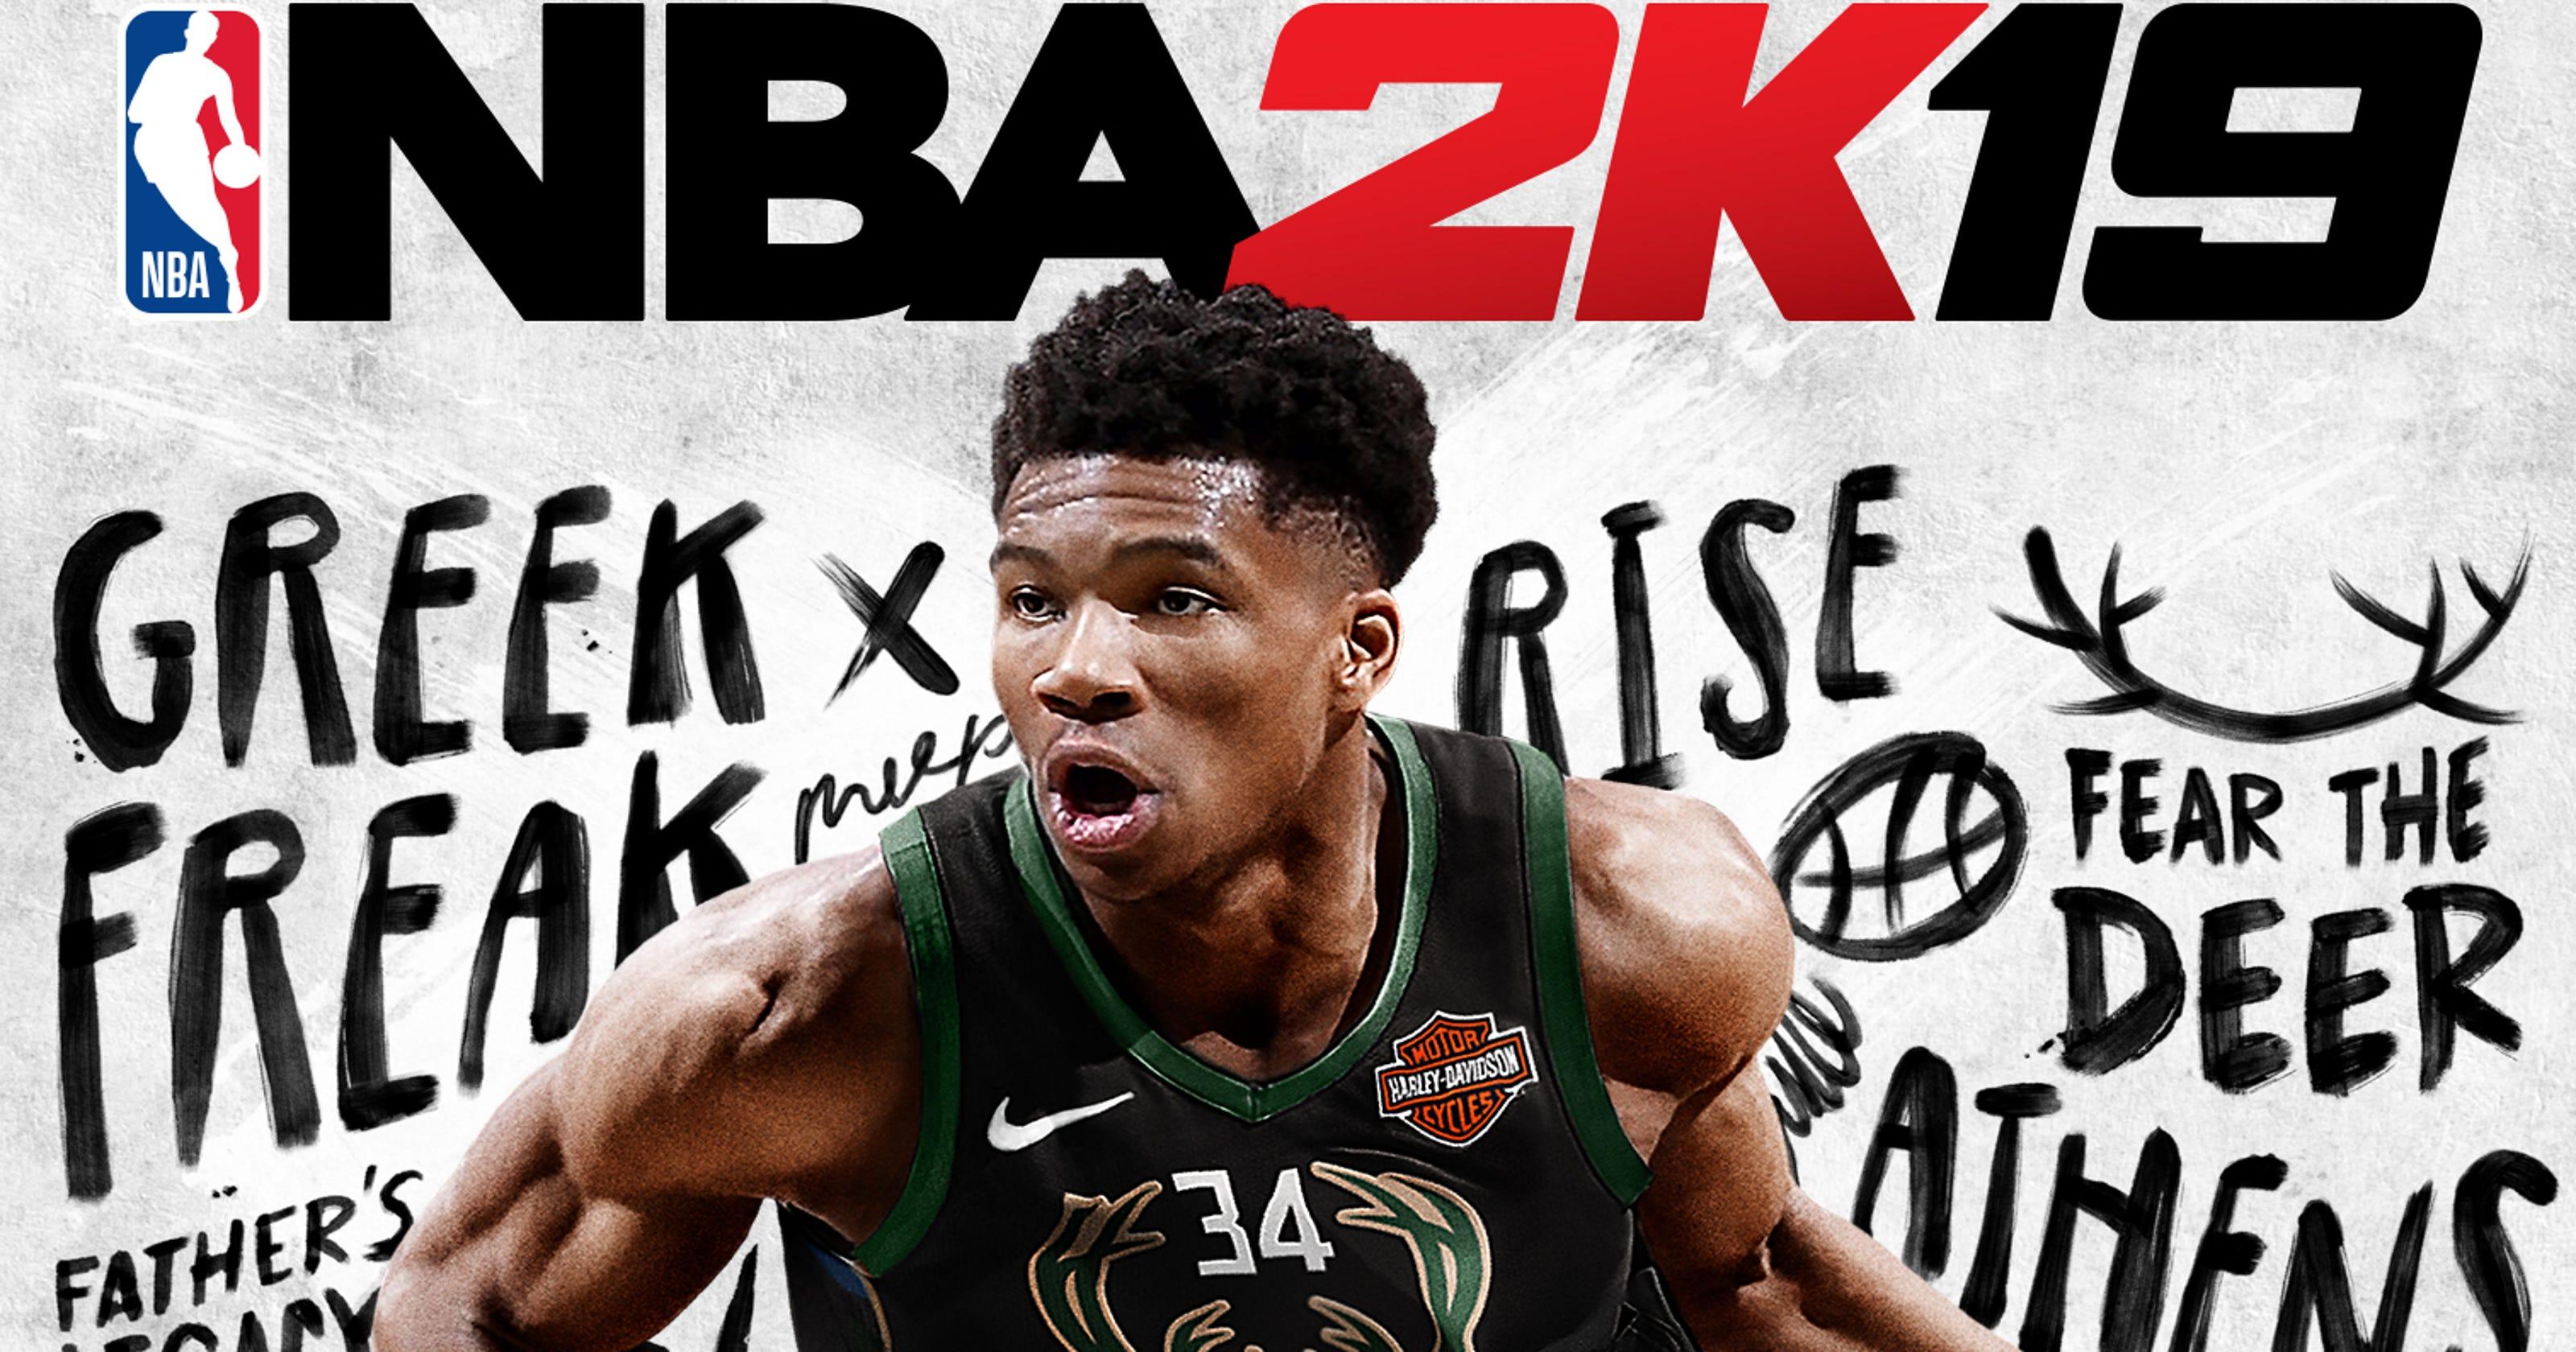 Dope Nba 2k19 Background: Bucks' Giannis Antetokounmpo Is NBA 2K19 Video Game Cover Star